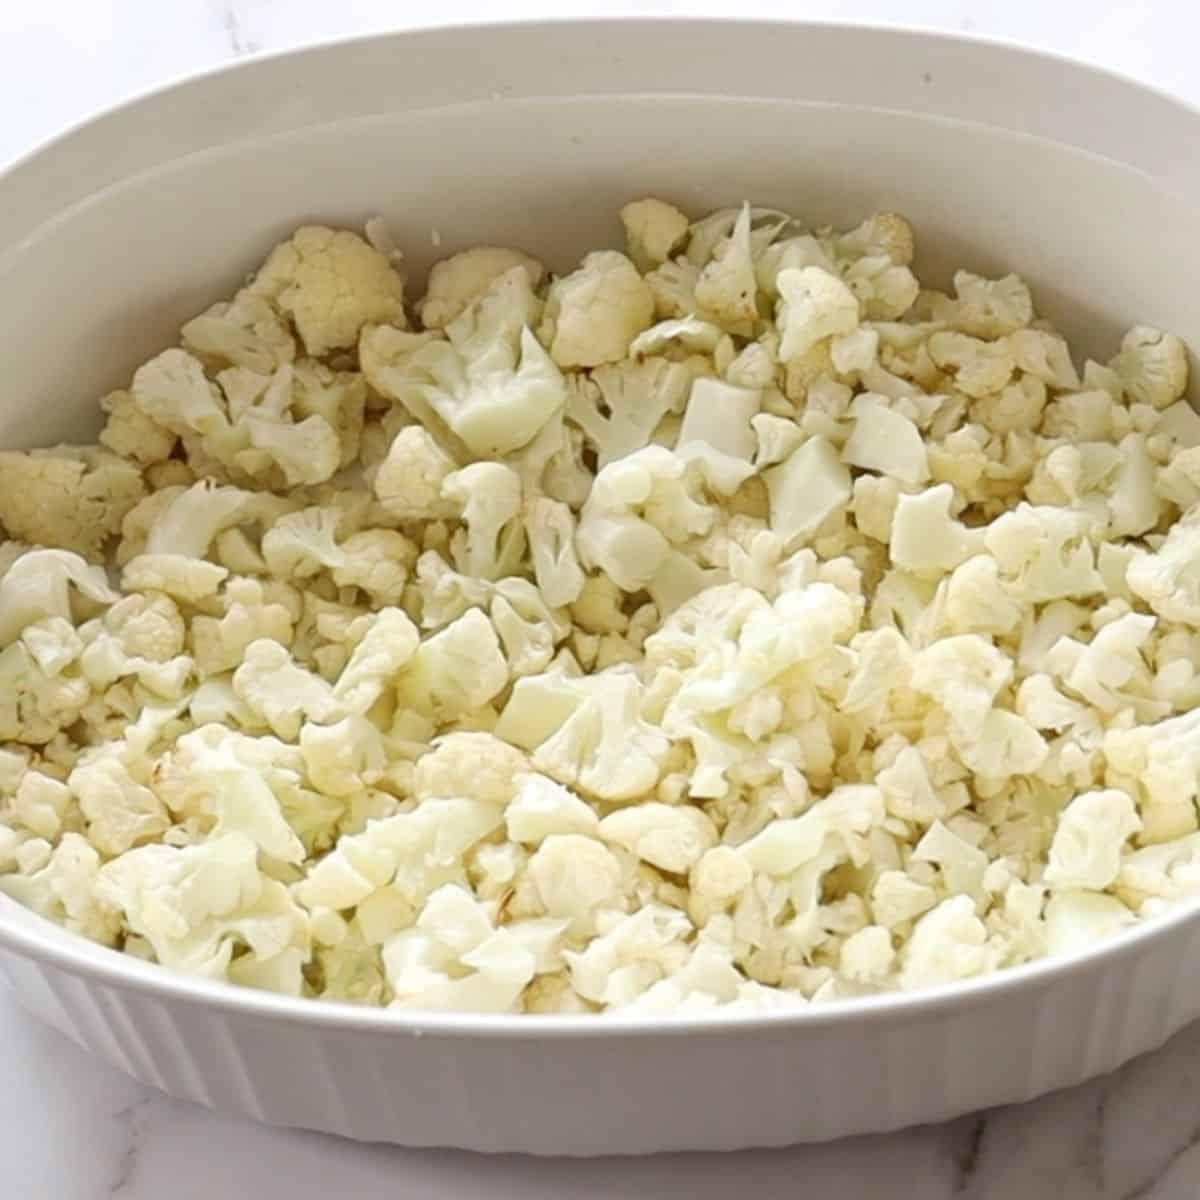 add roasted cauliflower to baking dish